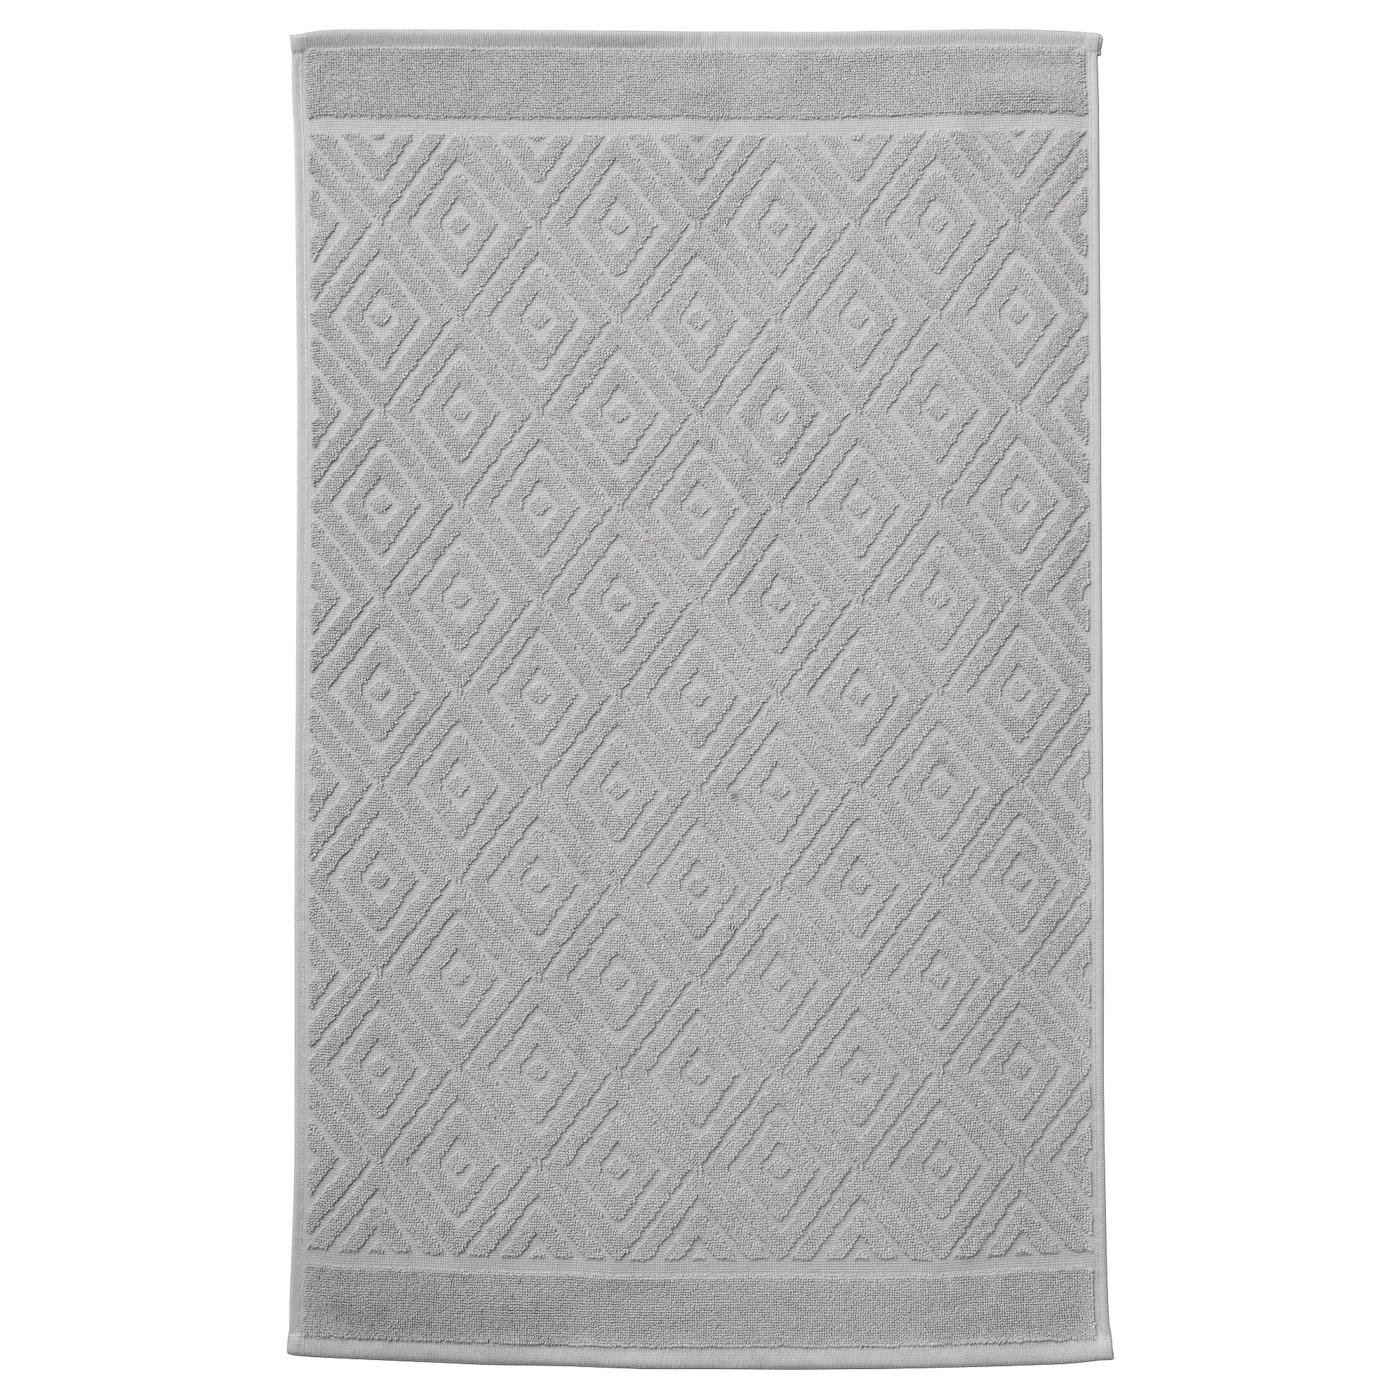 mat charcoal stripes and bathmat bath natural trubmwht mats with black truva white